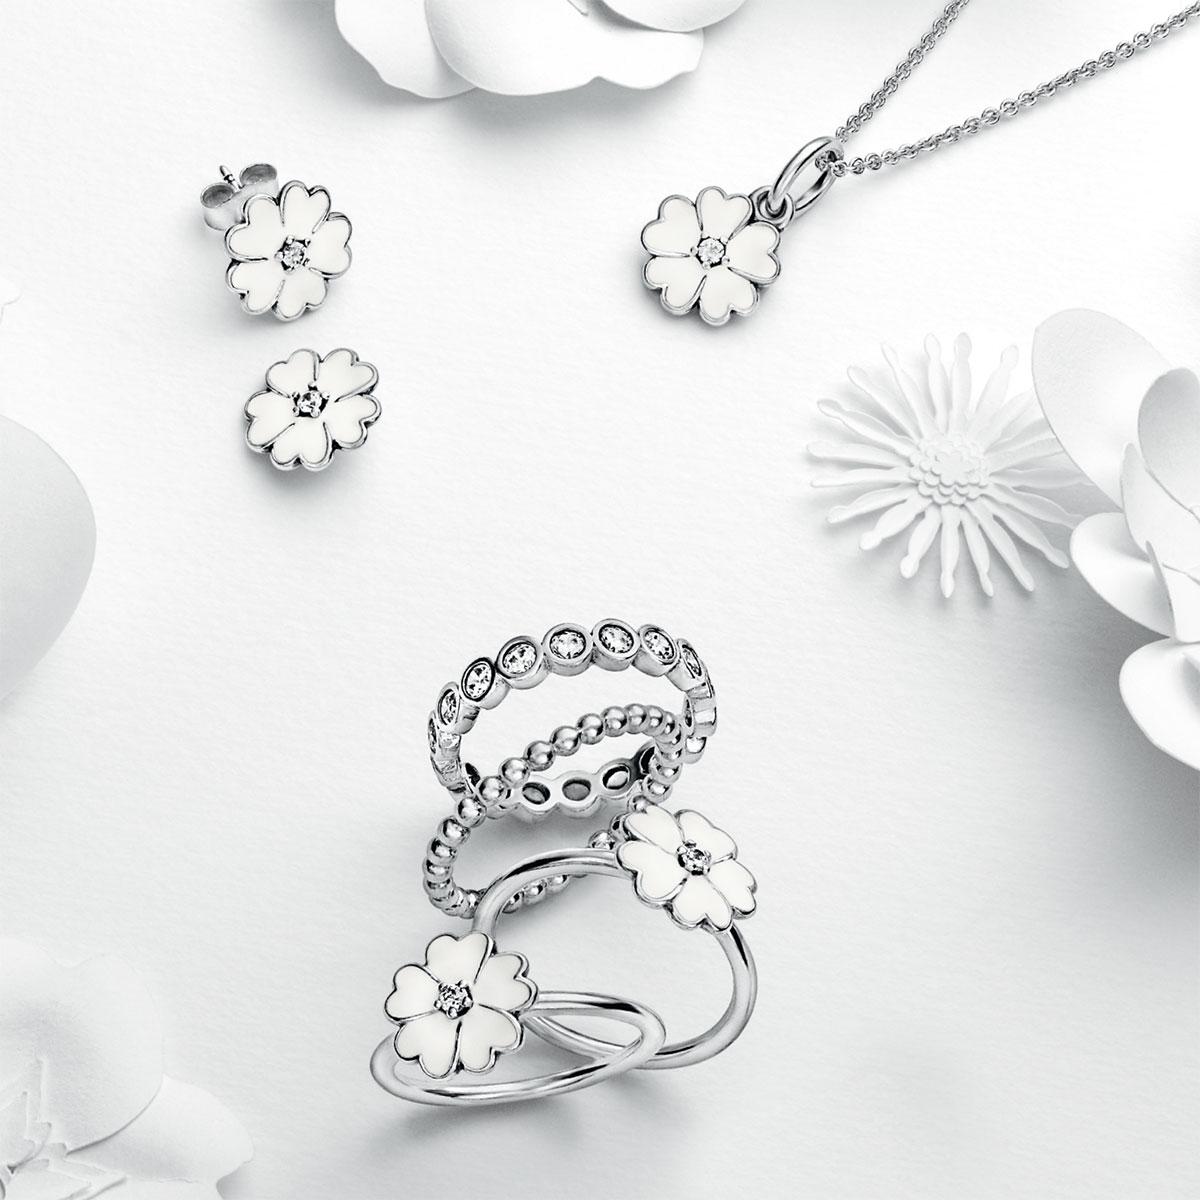 Pandora pendants pancharmbracelets pandora primrose with white enamel pendant pandora primrose with white enamel pendant alt aloadofball Choice Image